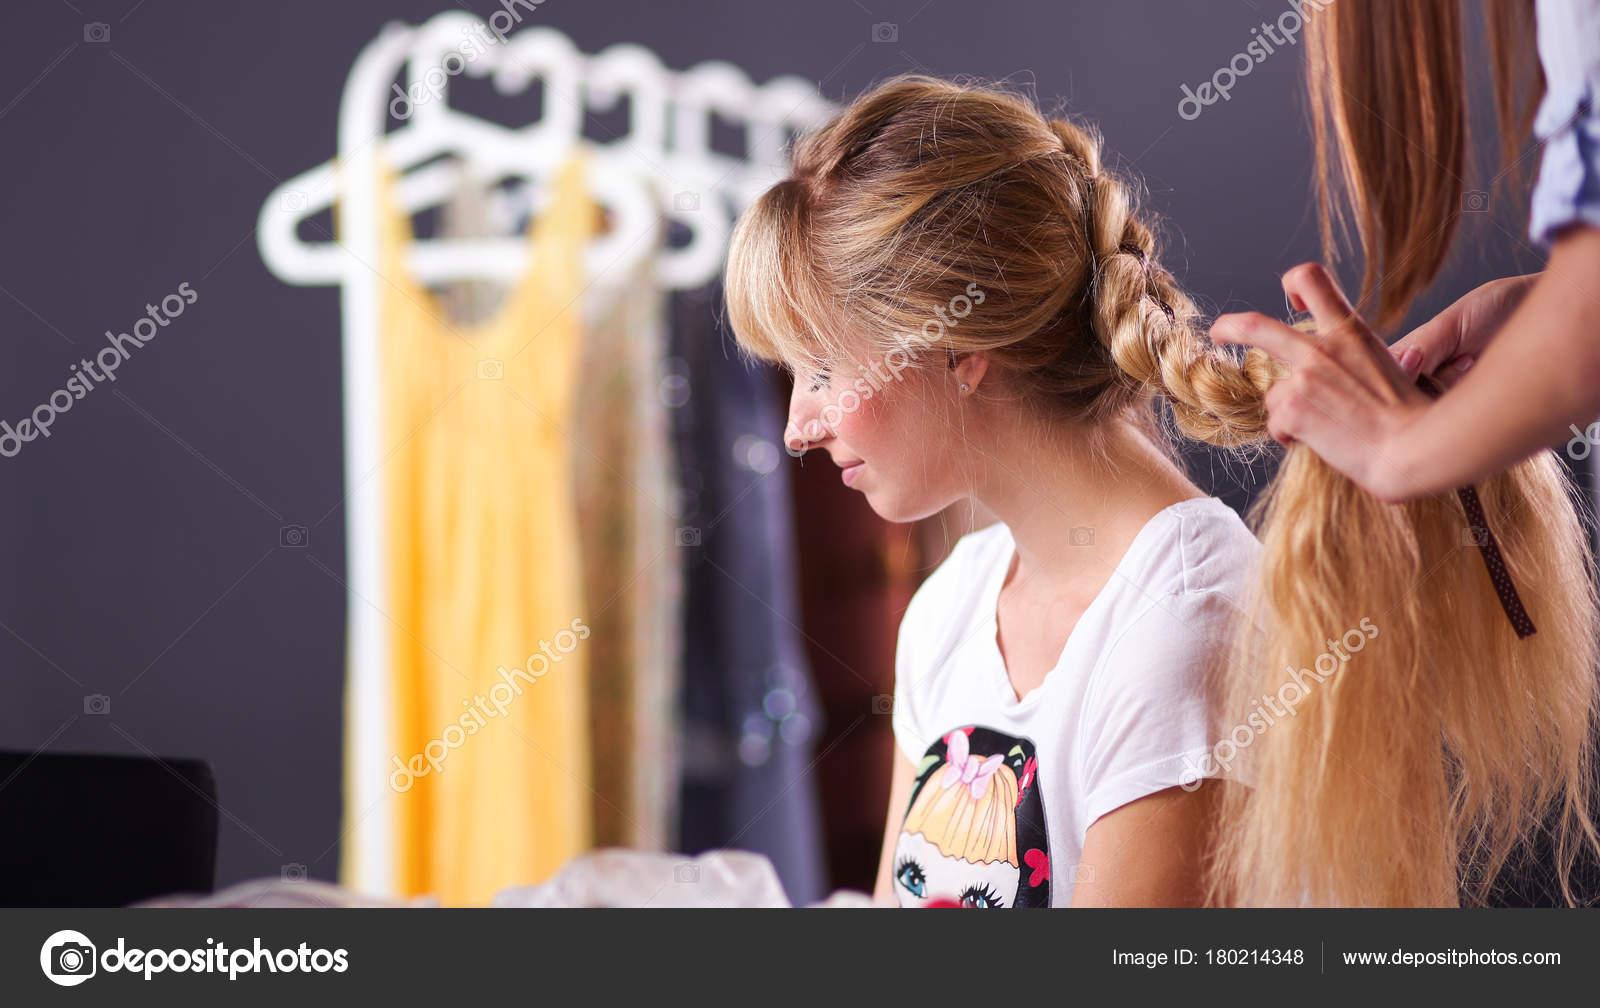 Junge Frau Friseur Tun Madchen Frisur Im Salon Stockfoto